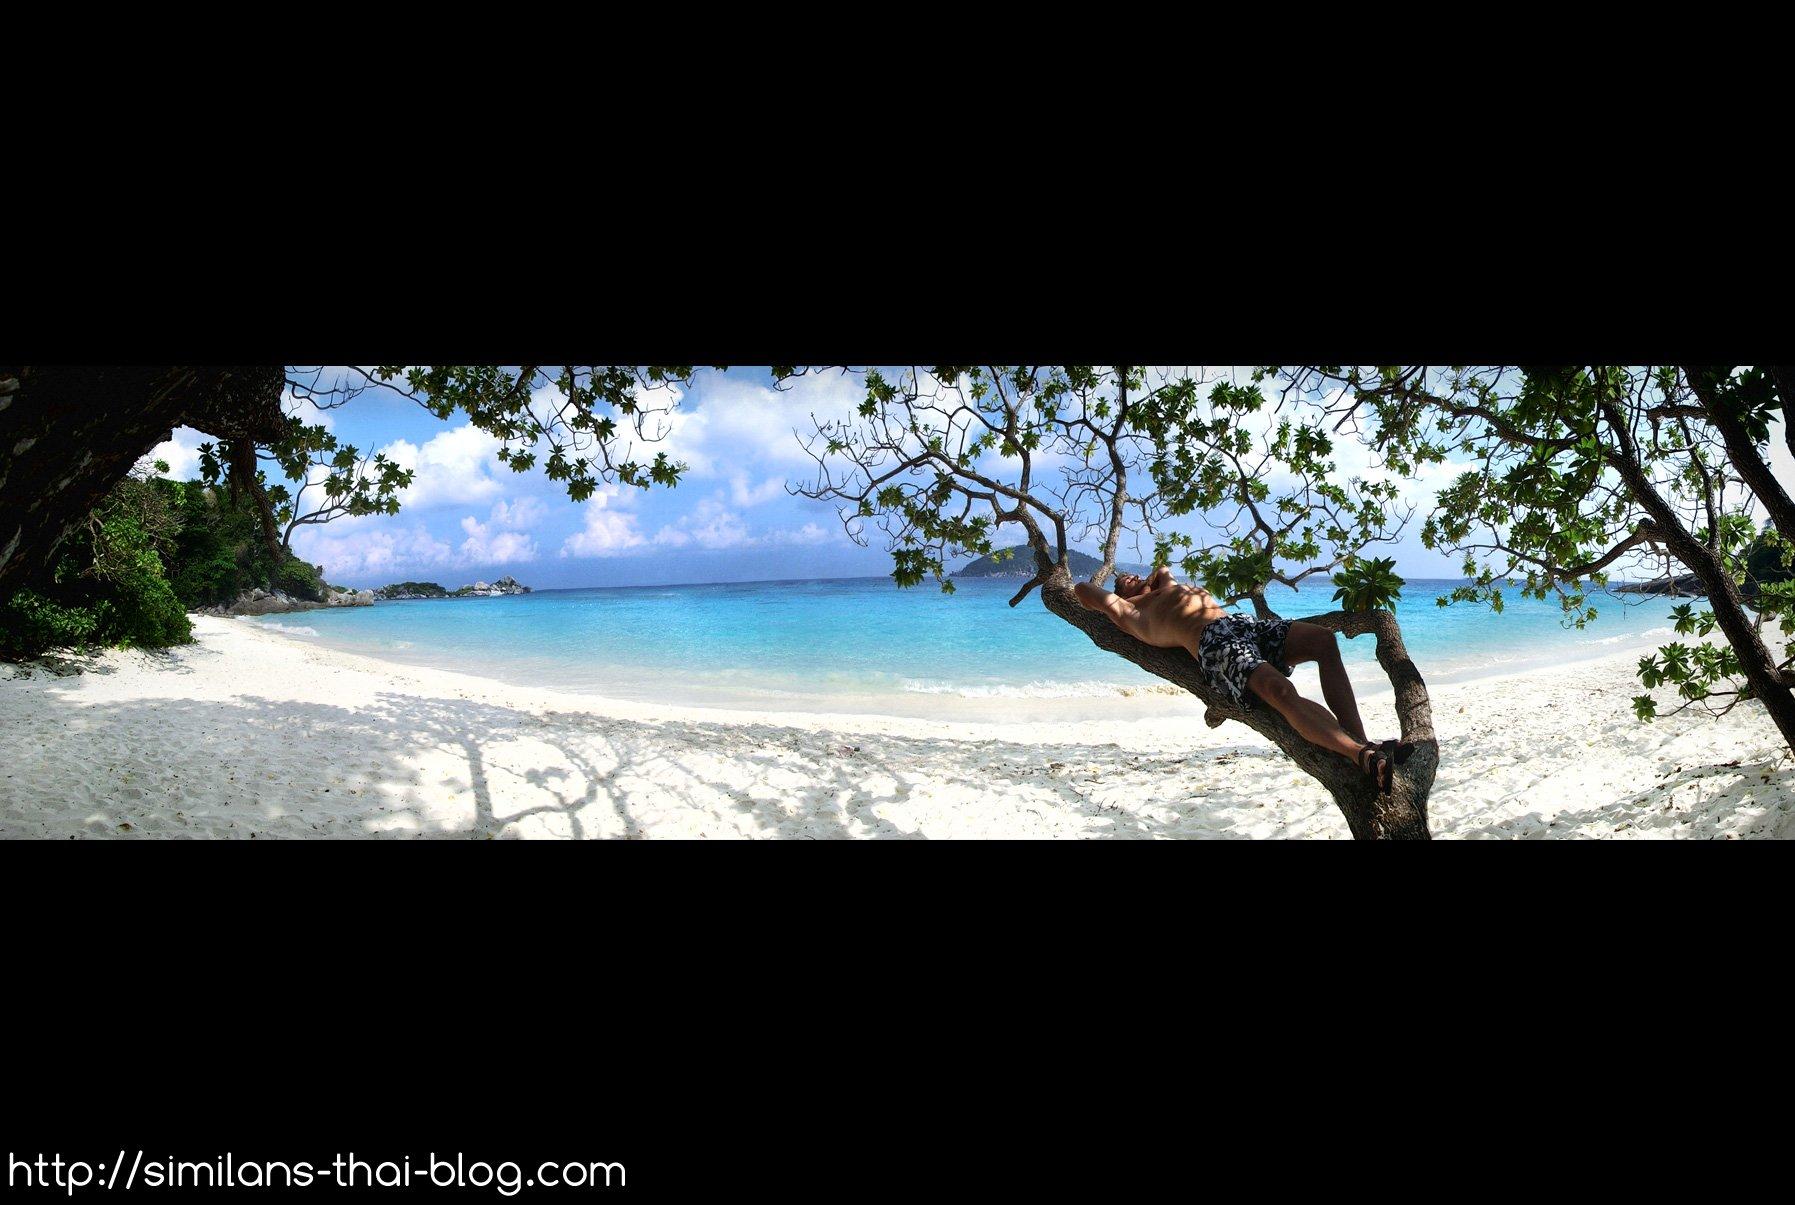 similan island nr. 4 beach panorama